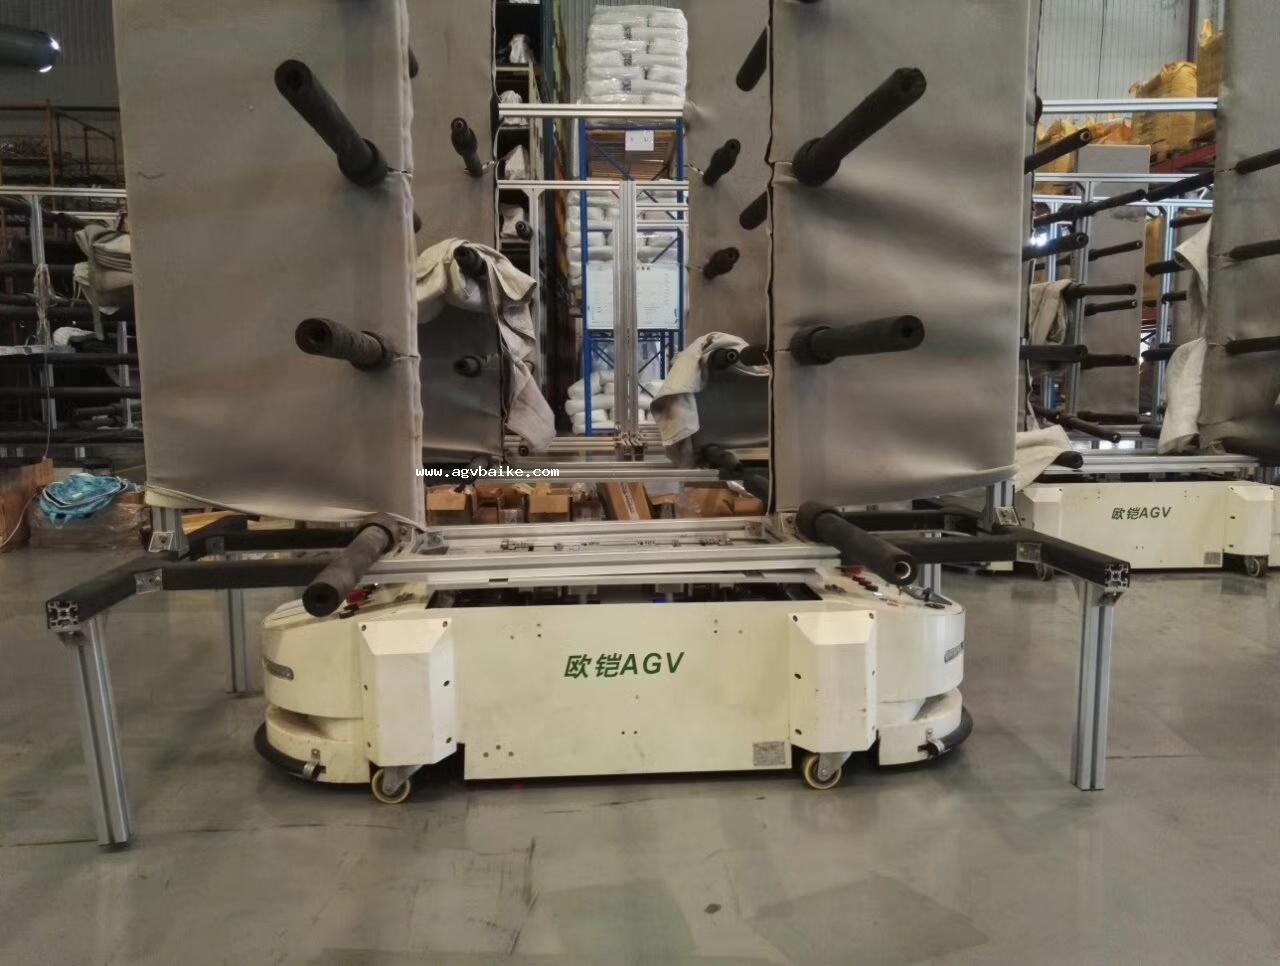 AGV机器人在柔性制造系统中的作业流程分析